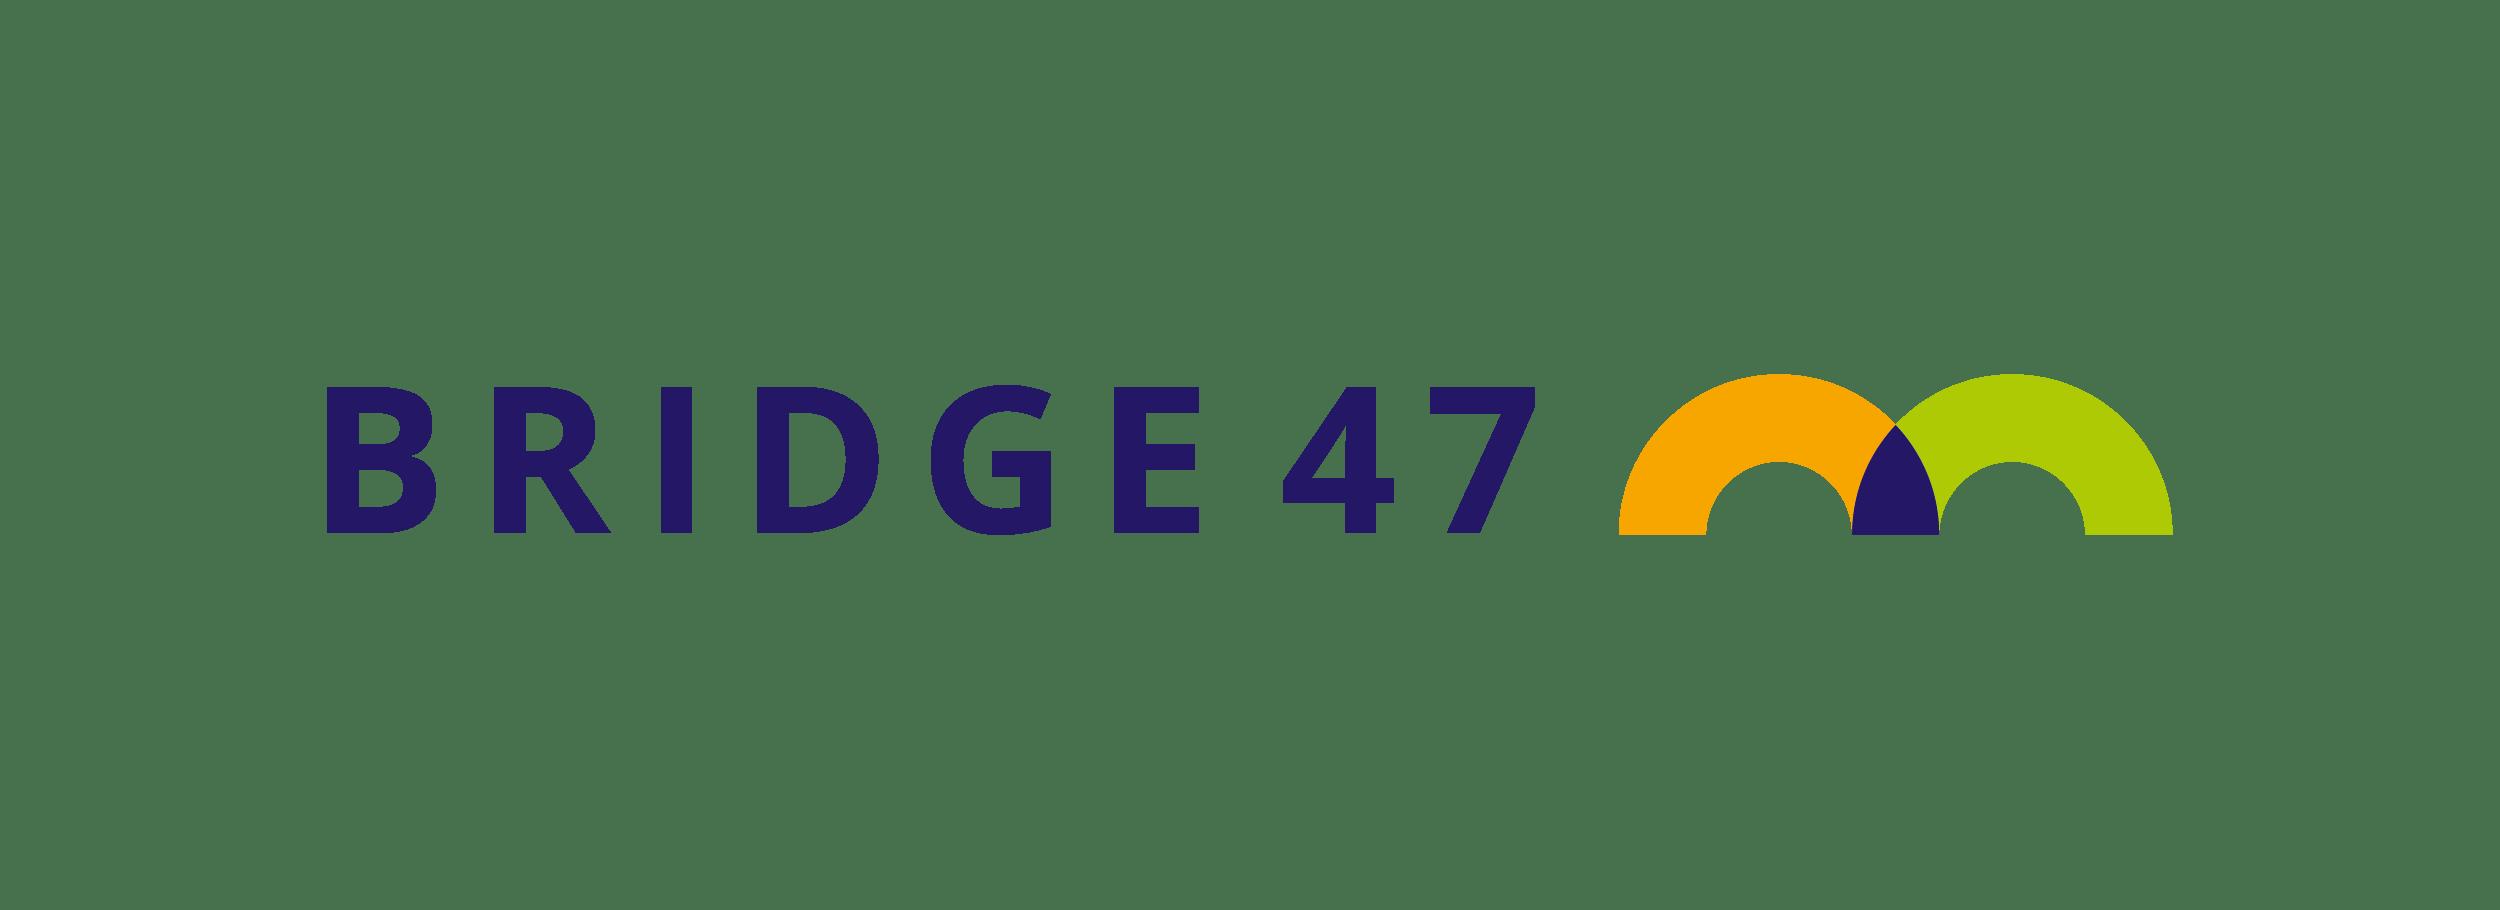 Bridge 47 logo